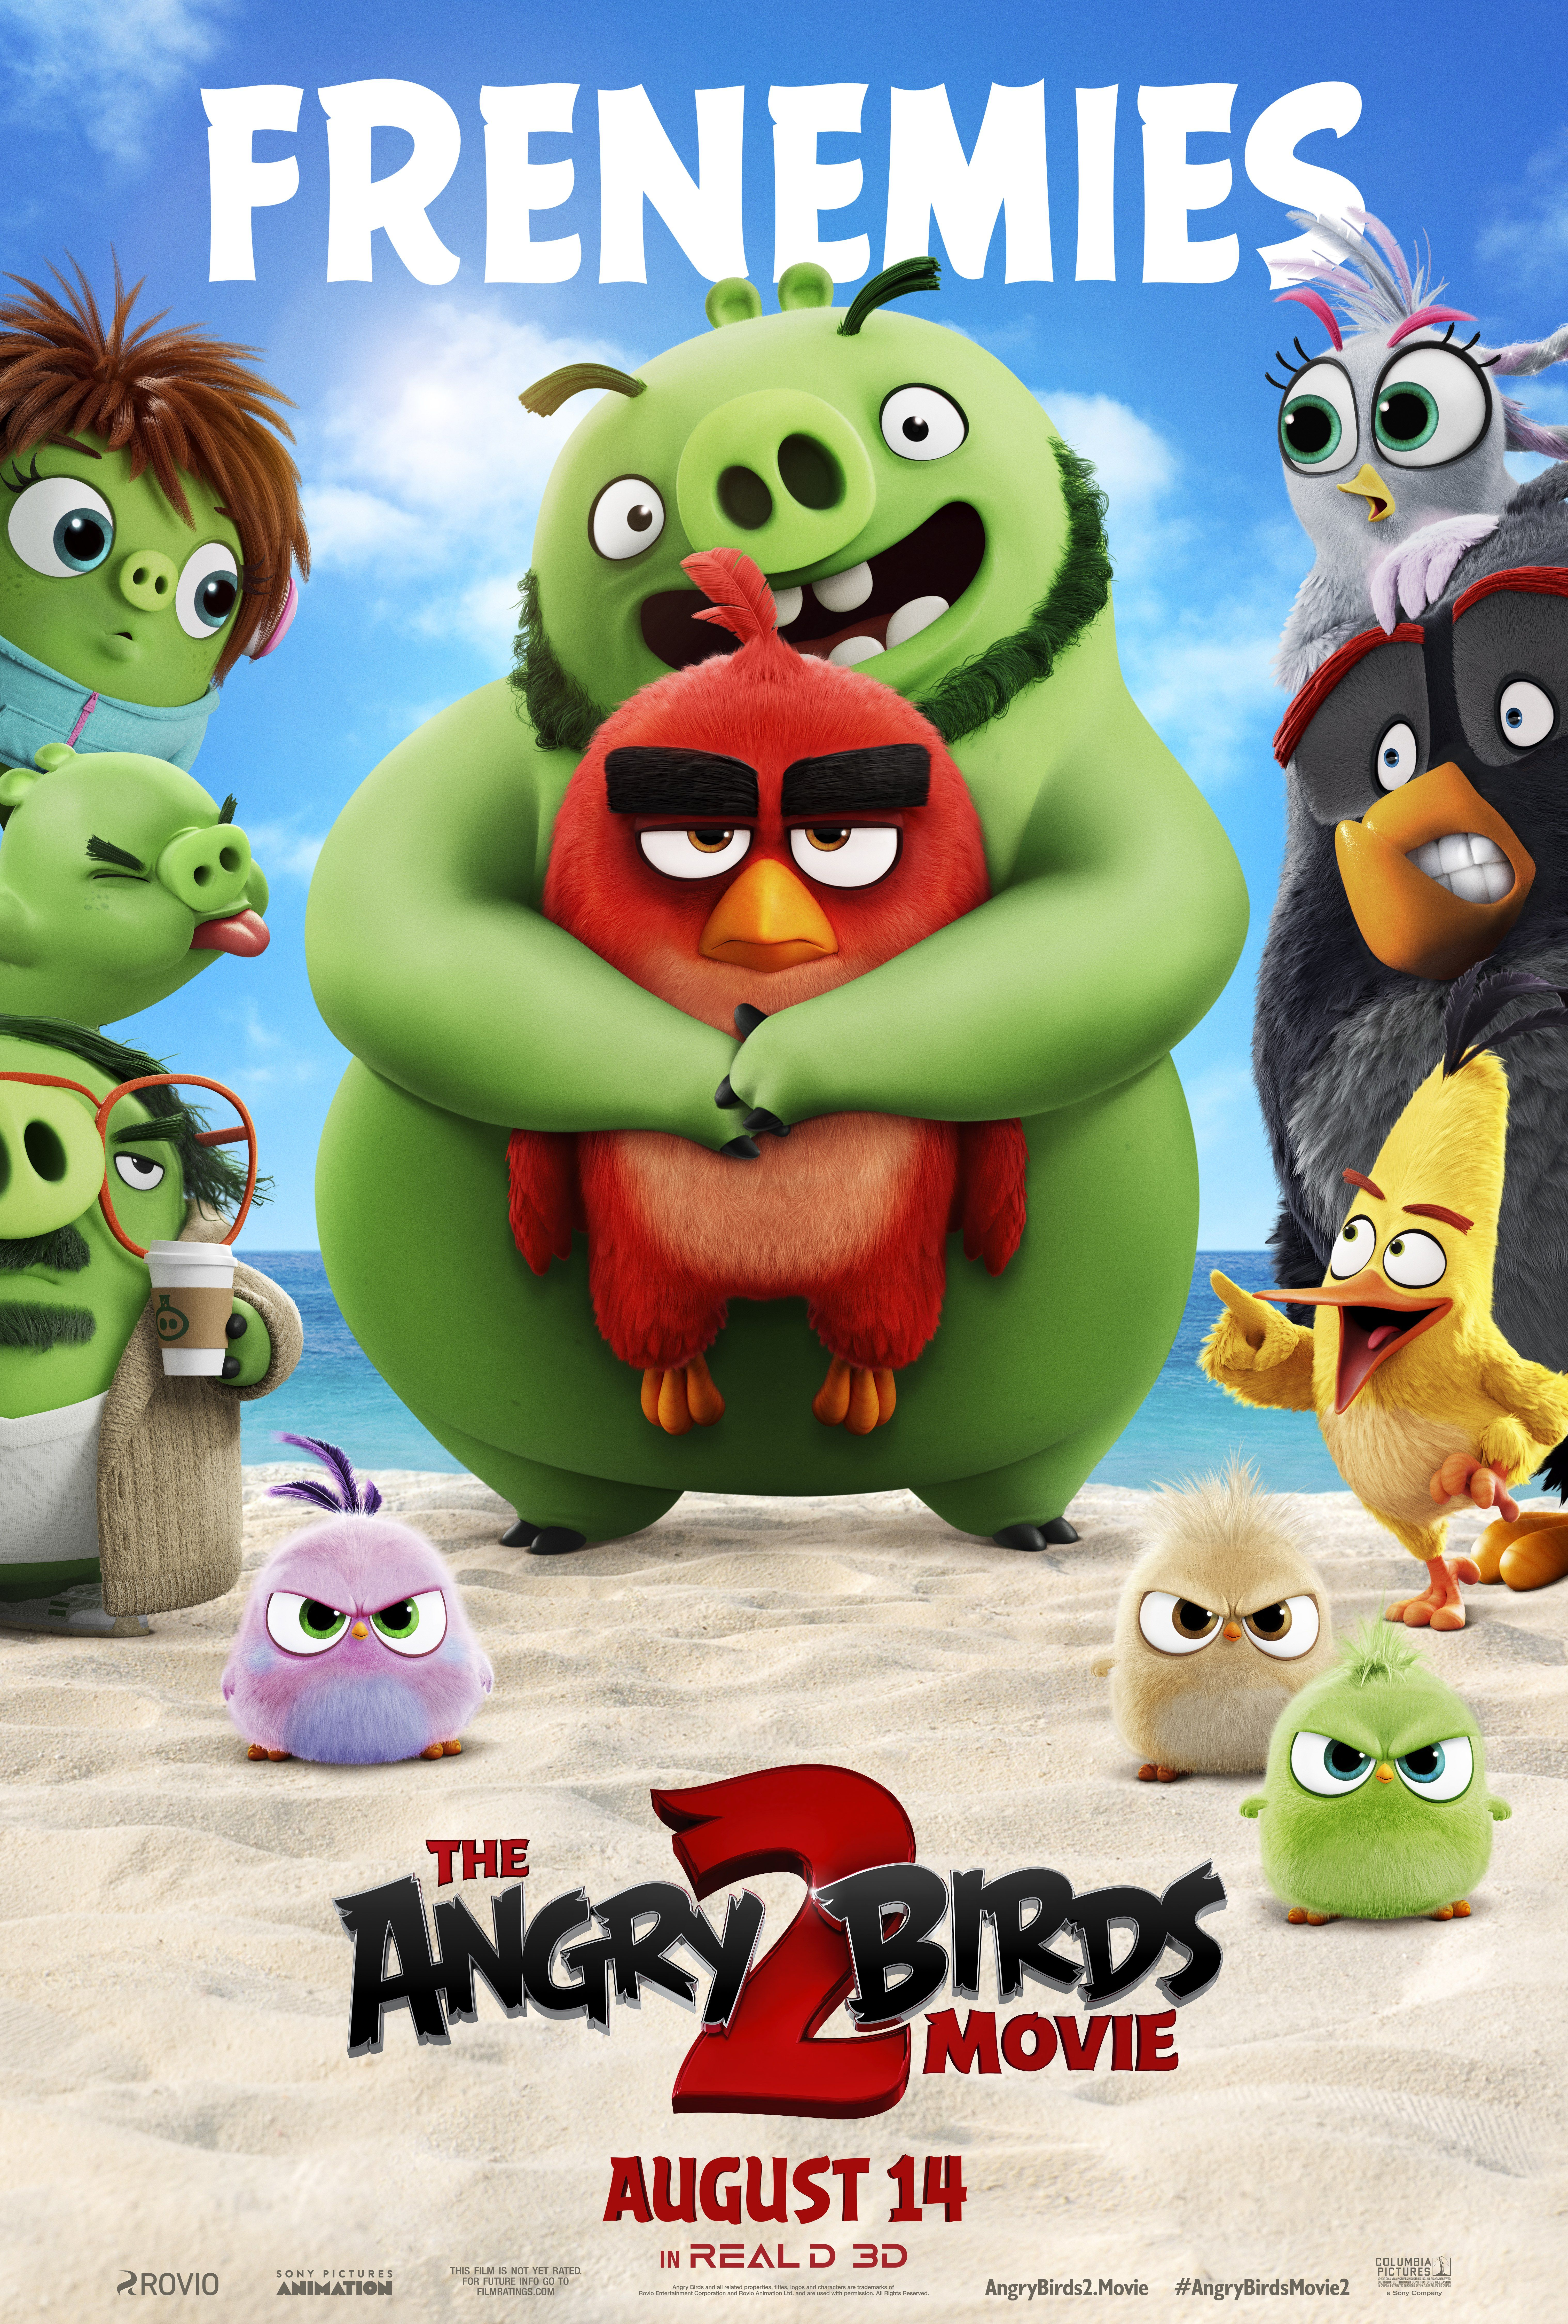 Frenemies In The Angrybirdsmovie2 Angry Birds Movie Angry Birds Angry Birds 2 Movie